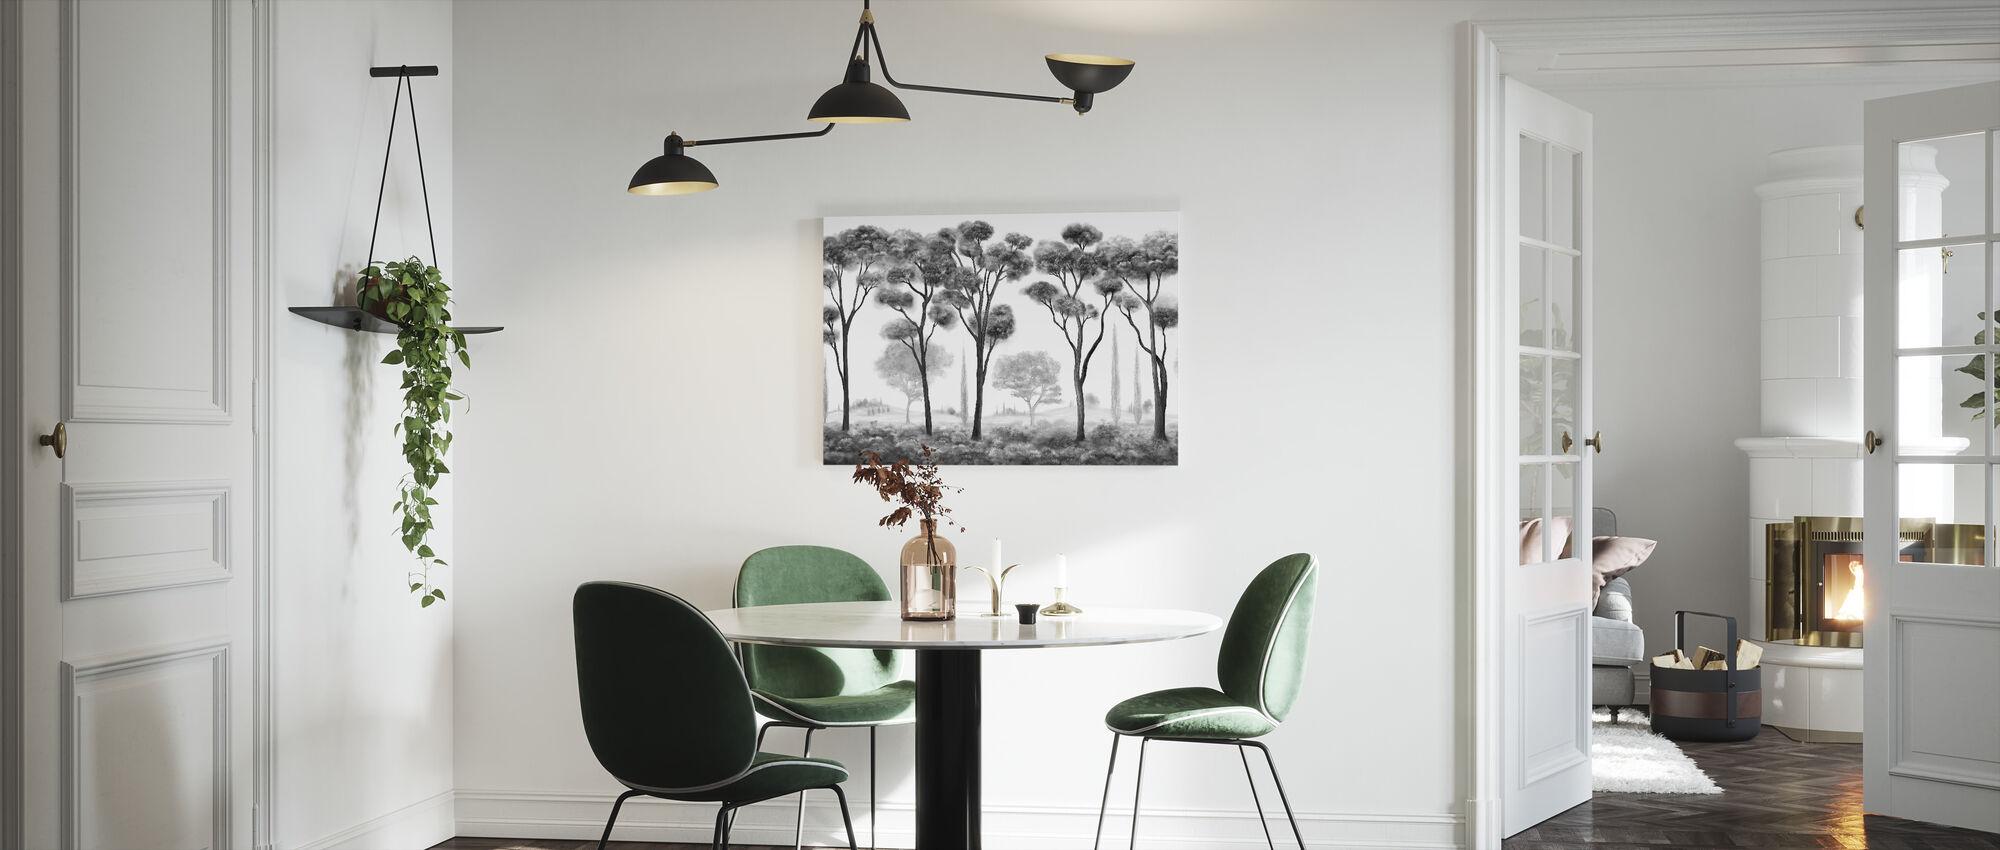 Shafts Chiaroscuro - Canvas print - Kitchen